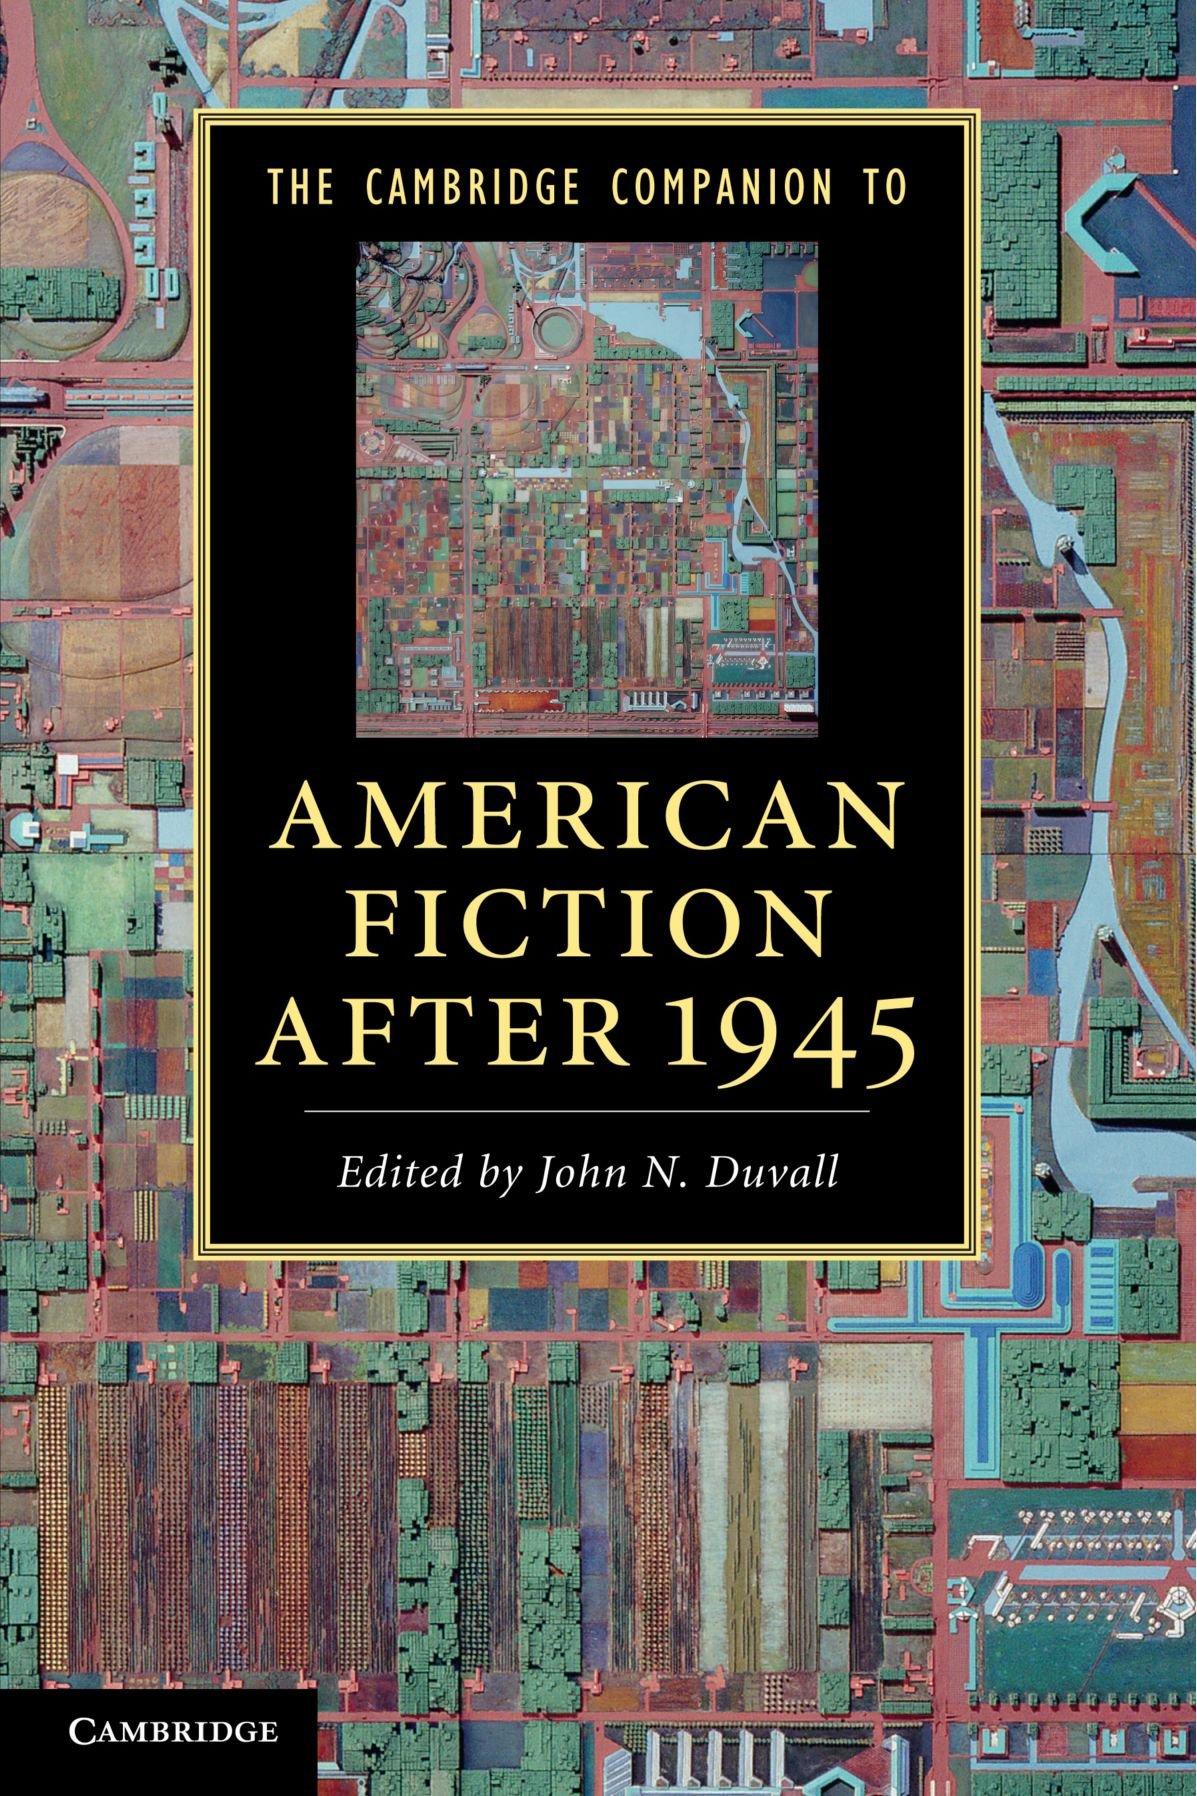 The Cambridge Companion to American Fiction after 1945 (Cambridge Companions to Literature) PDF